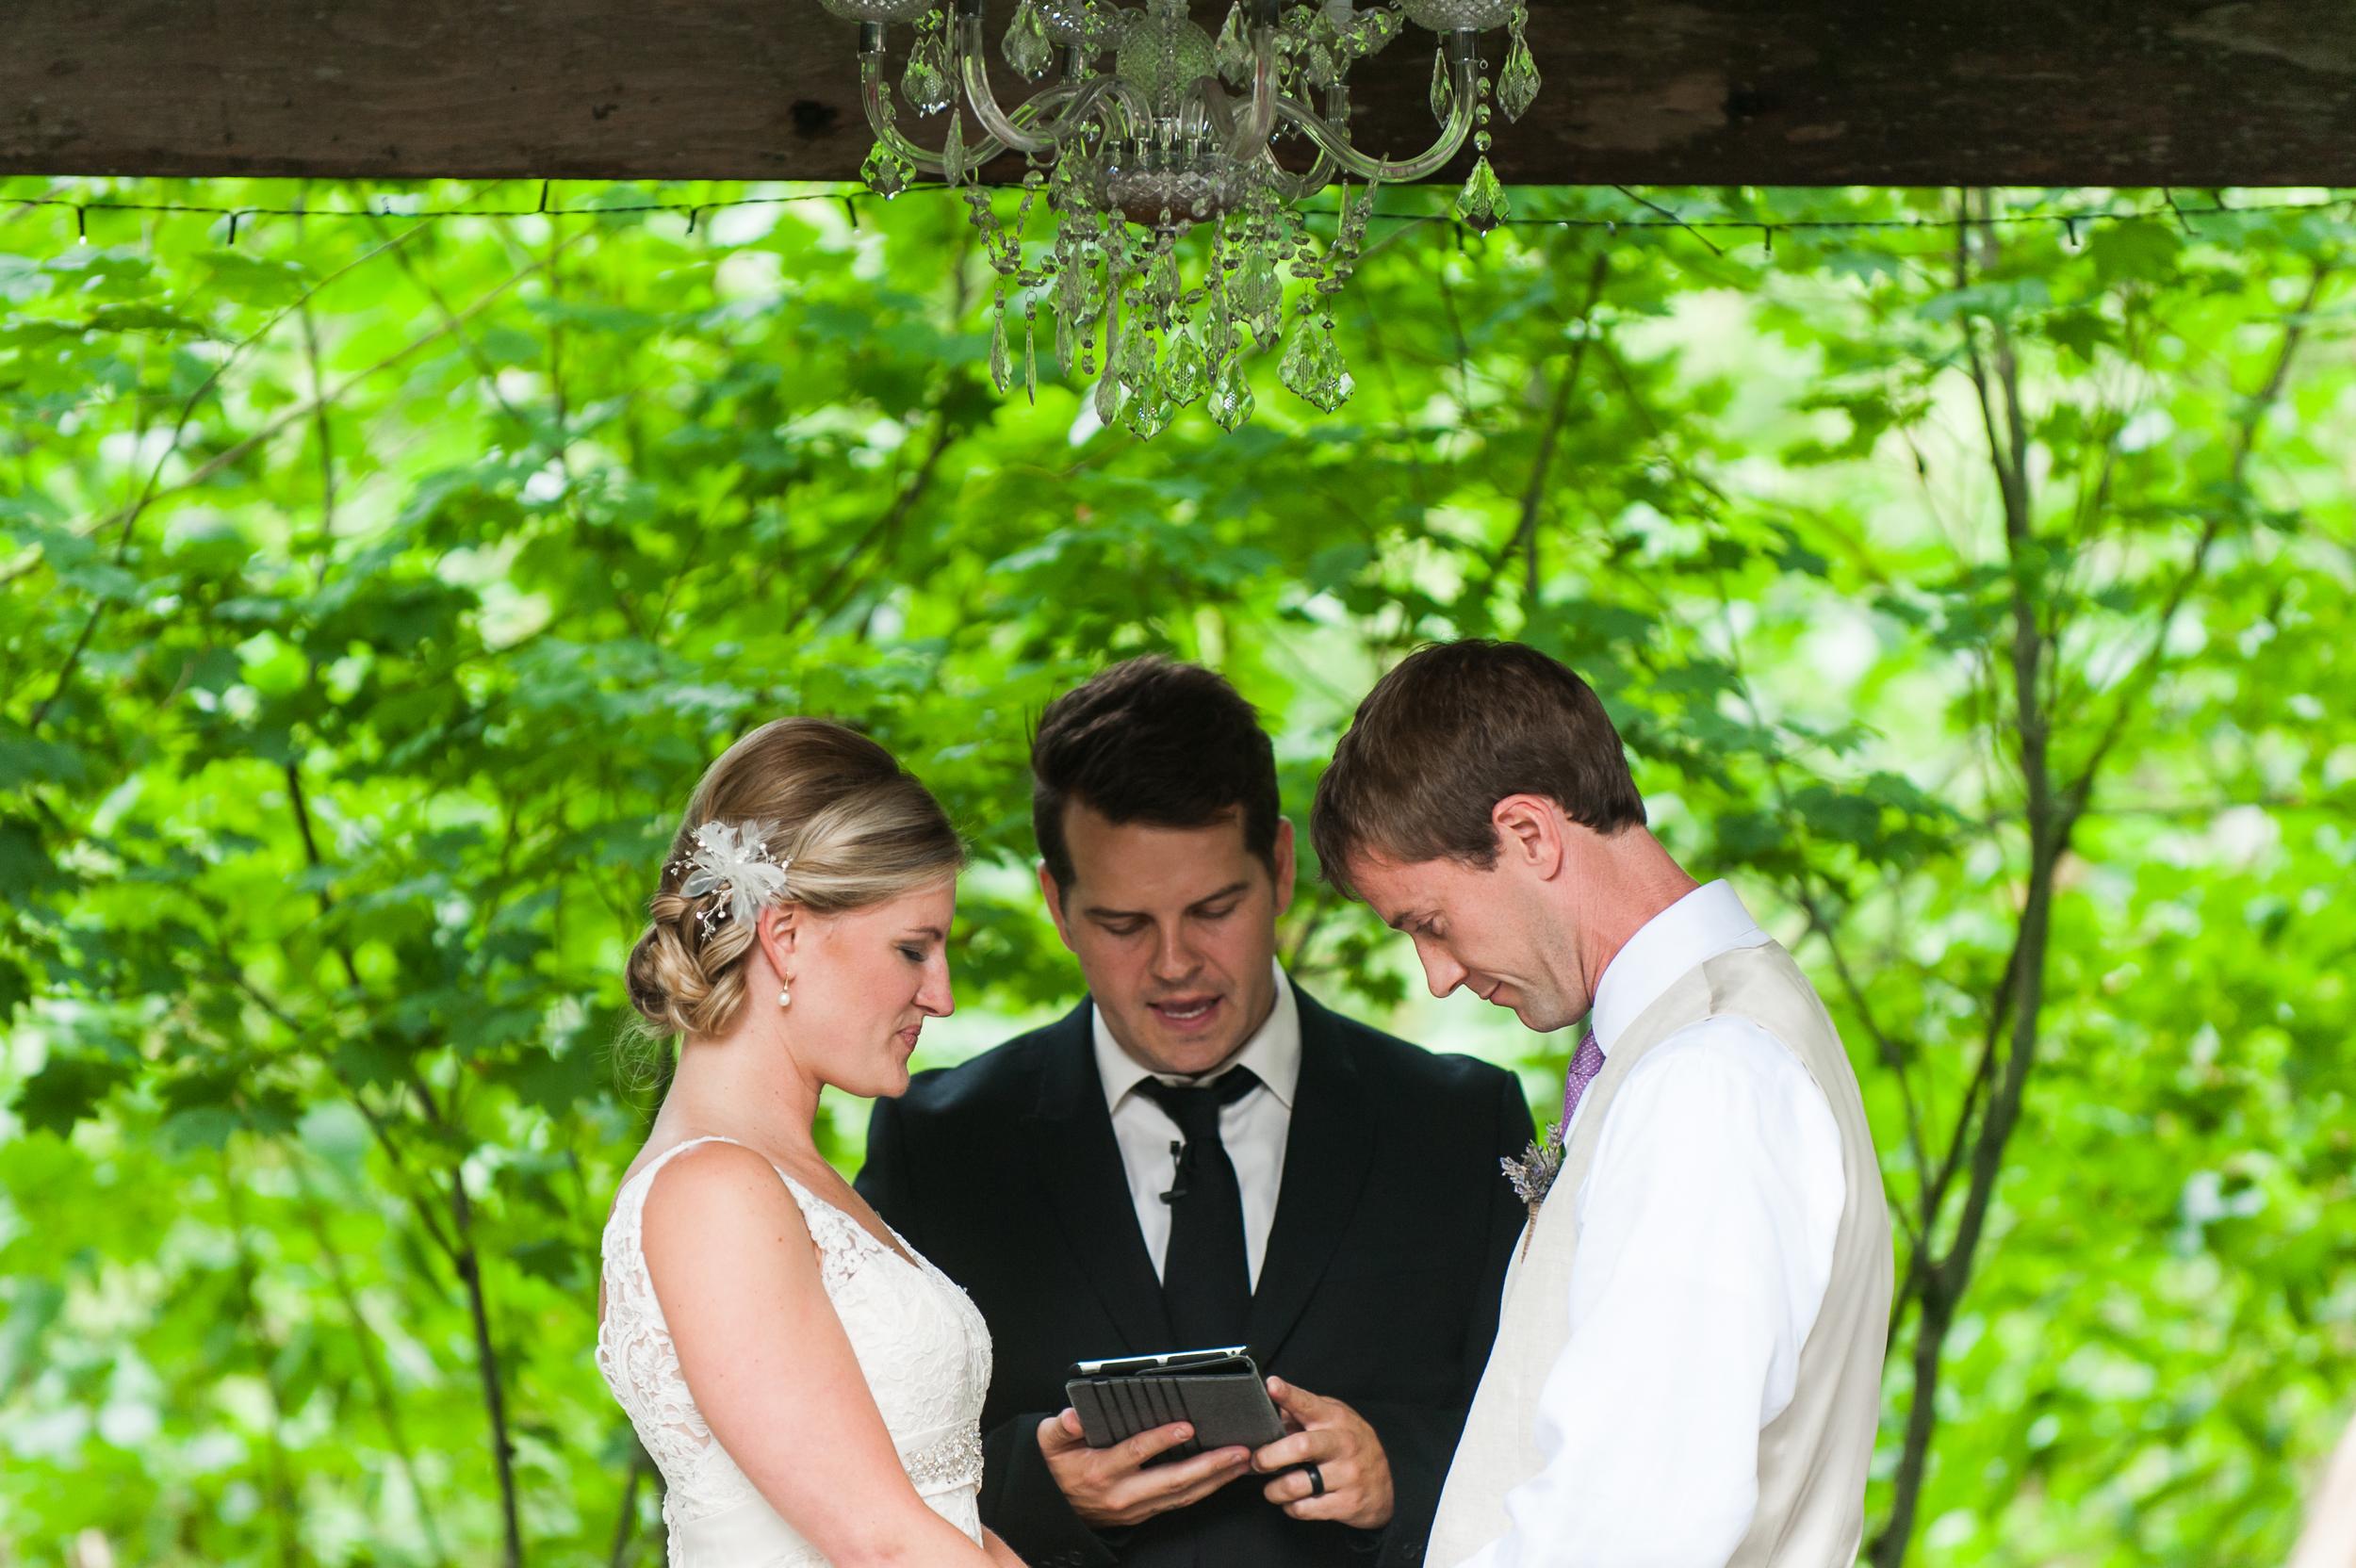 JJ-wedding-Van-Wyhe-Photography-396.jpg